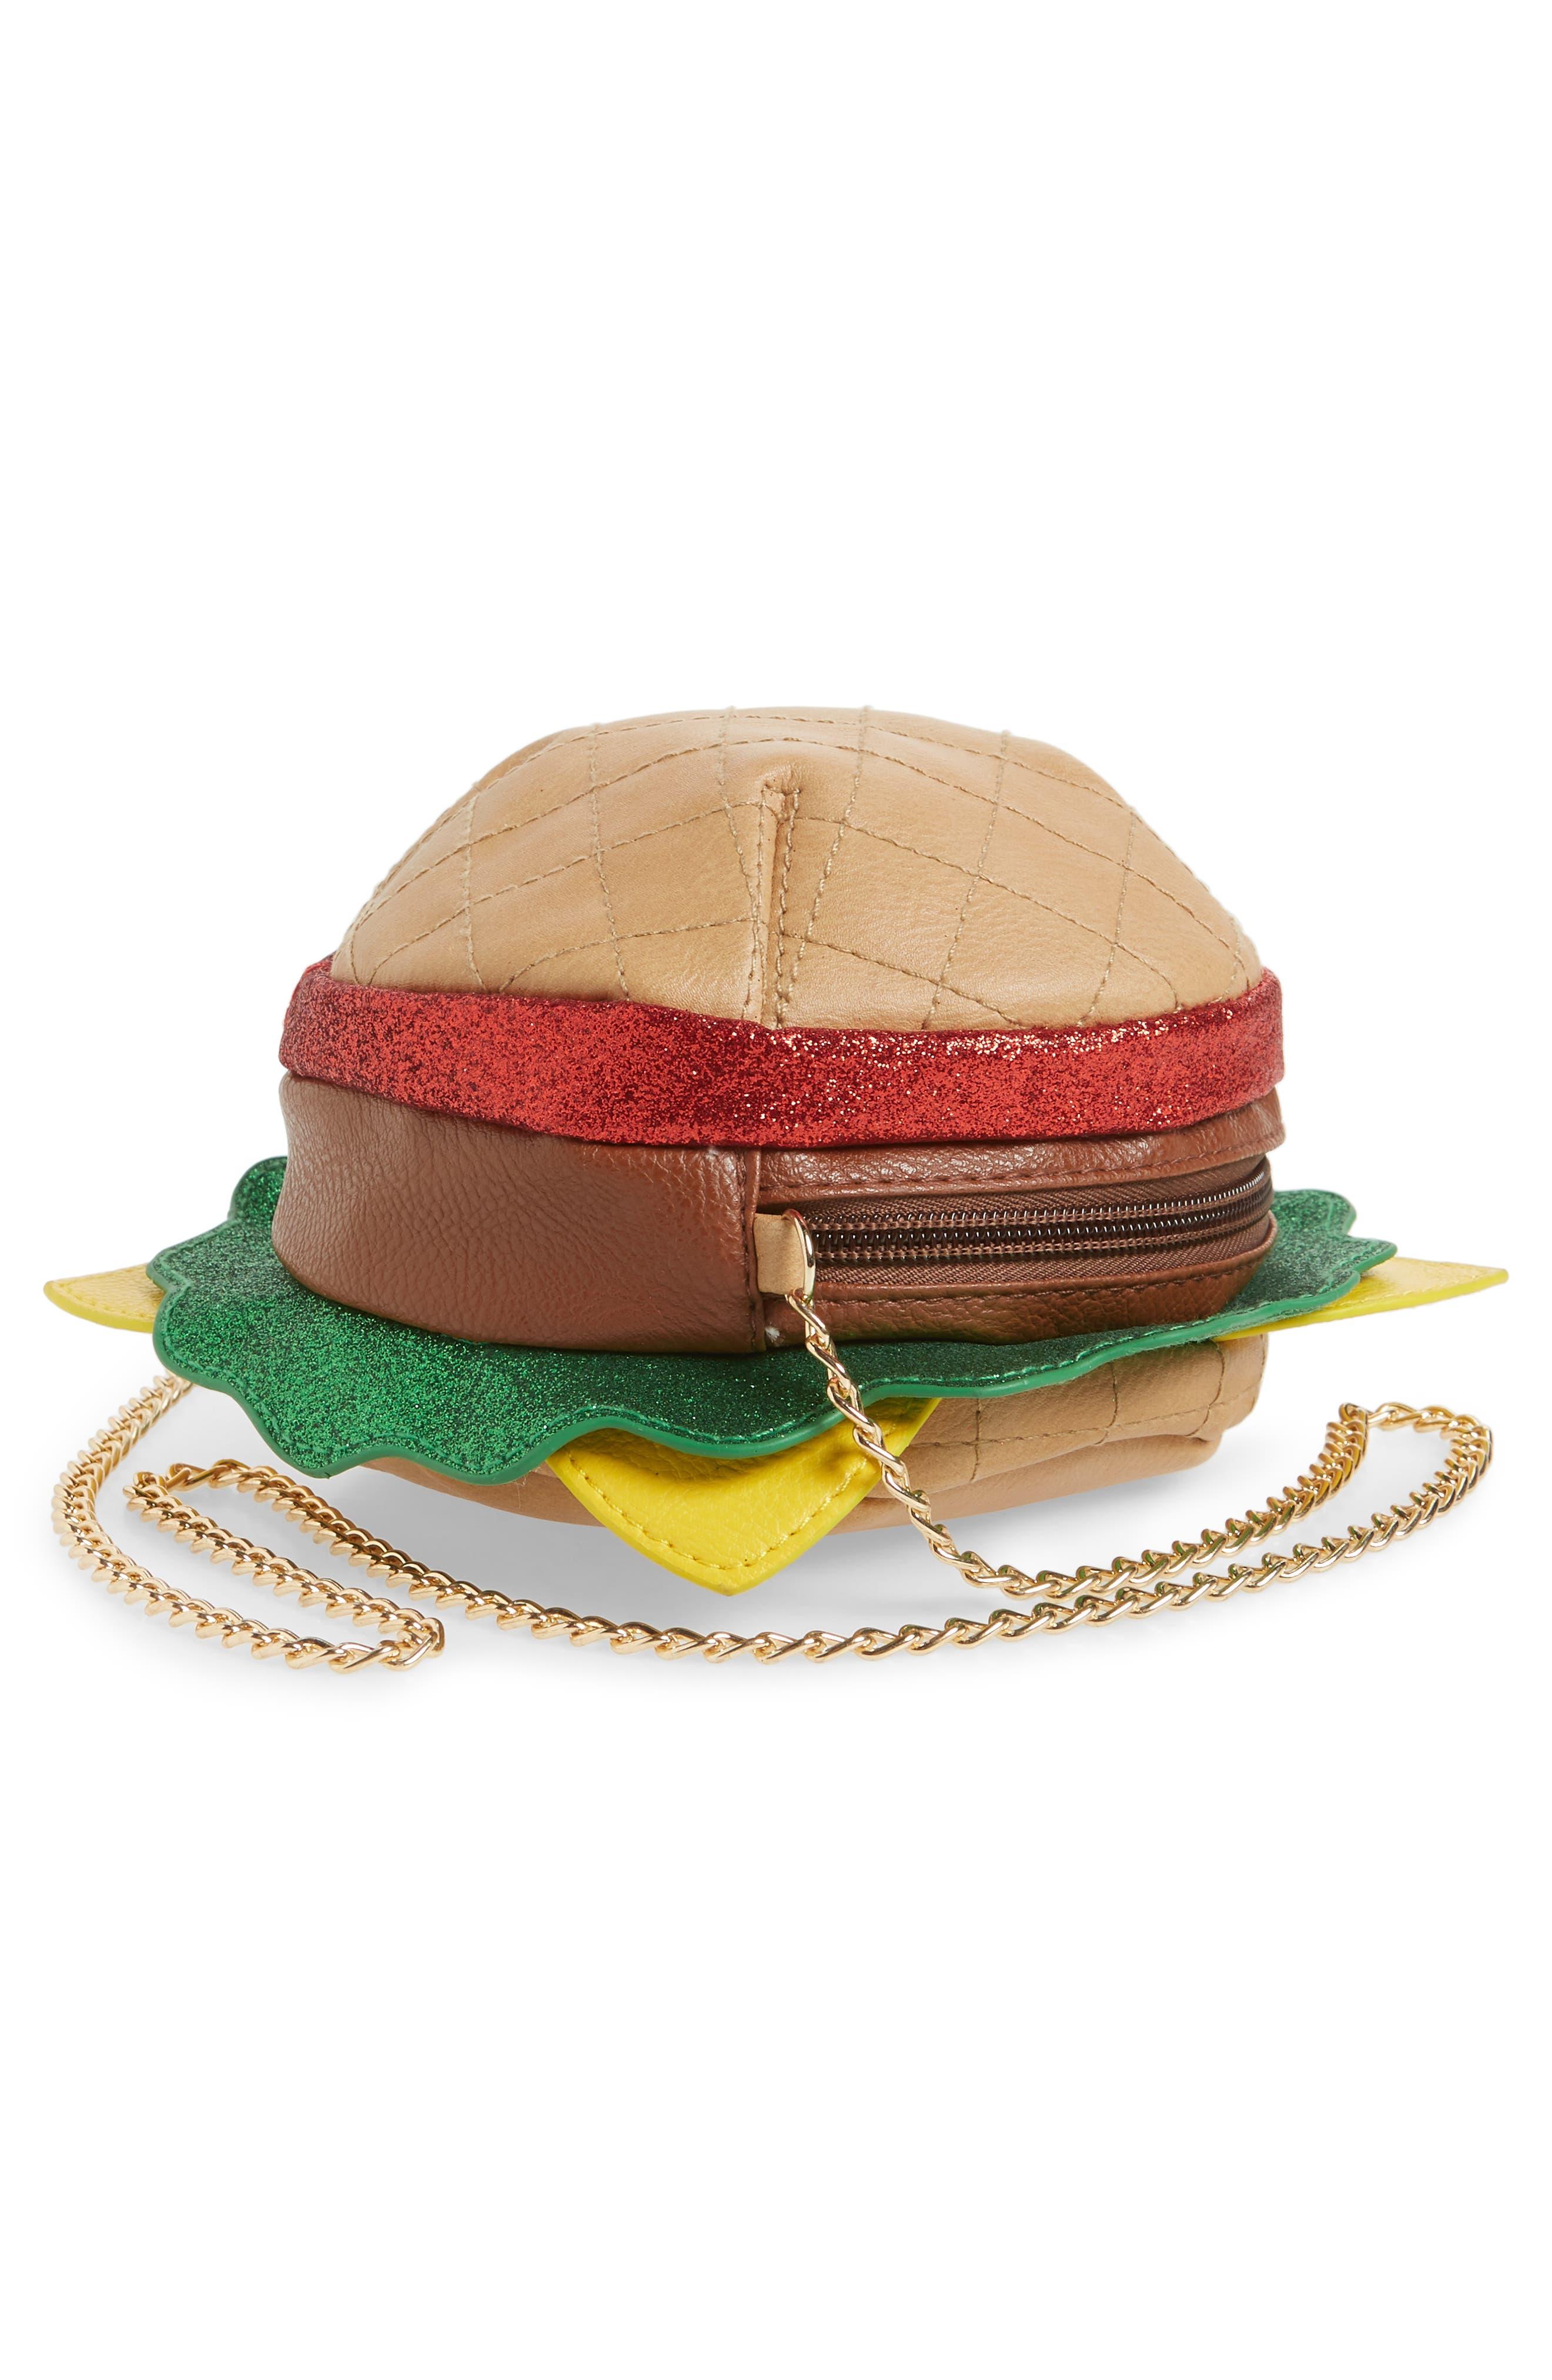 Hamburger Crossbody Bag,                             Alternate thumbnail 2, color,                             Multi Combo